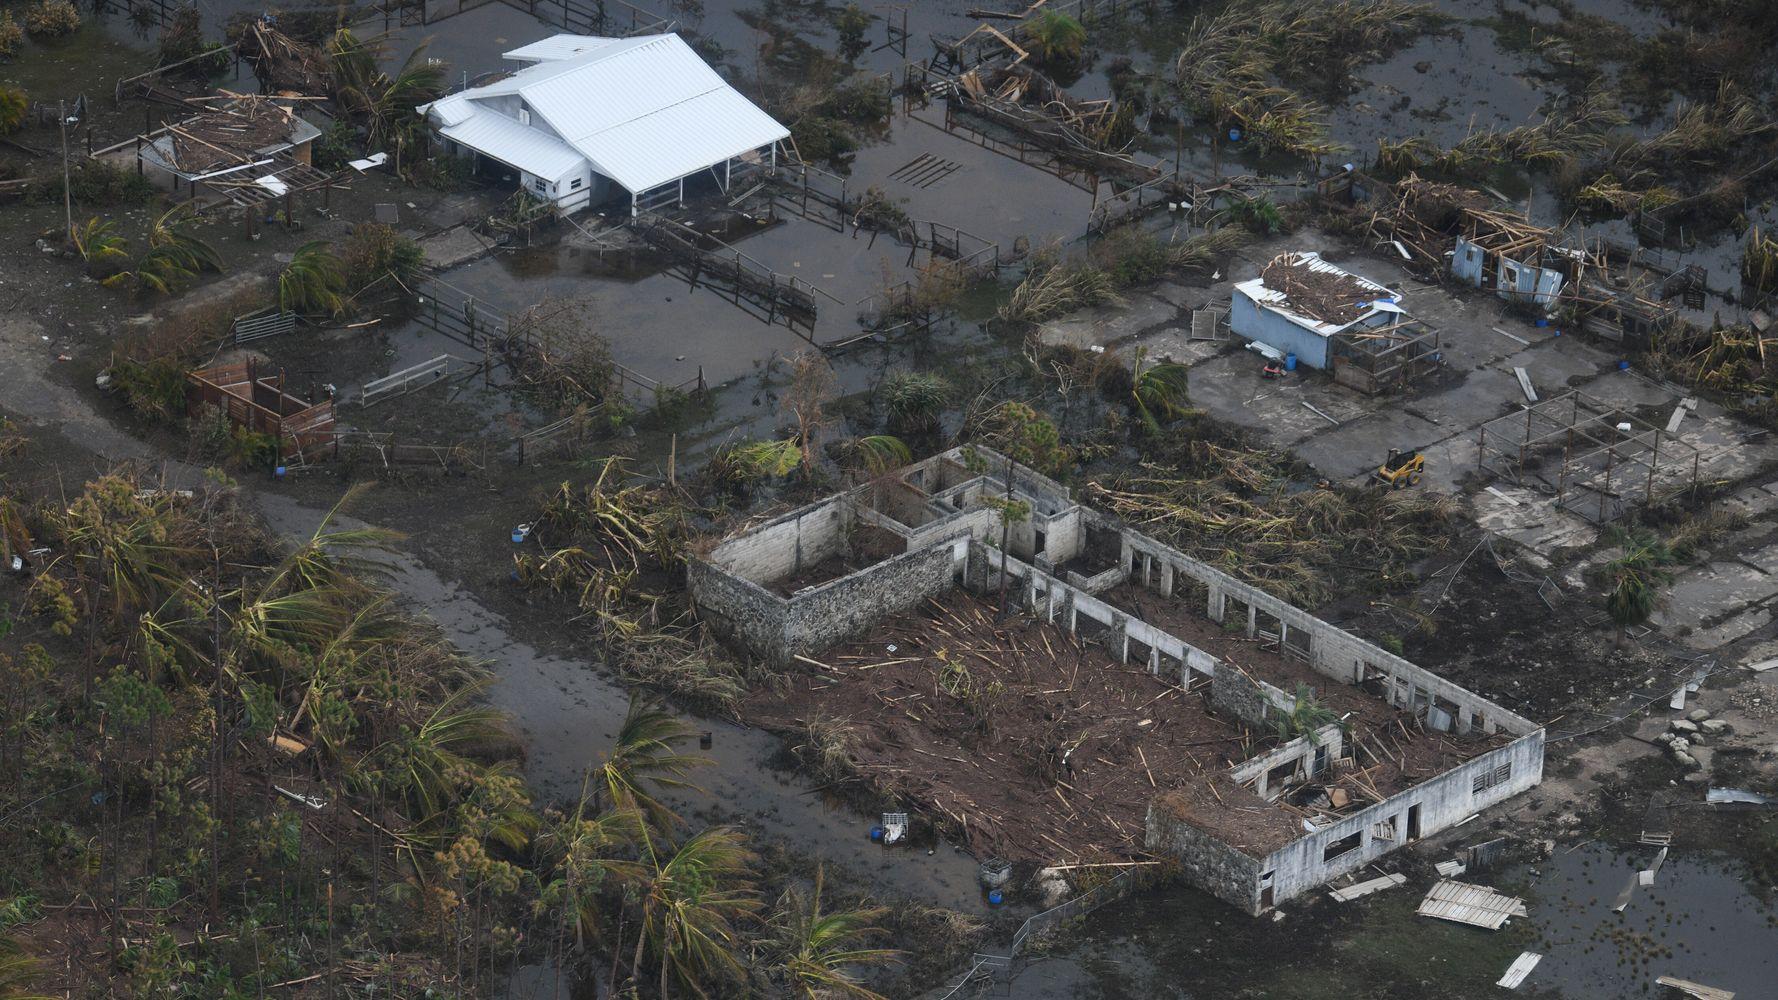 Westlake Legal Group 5d71d2273b0000e255d01098 Hurricane Dorian Death Toll In Bahamas Rises To 30 As Aid Begins To Land